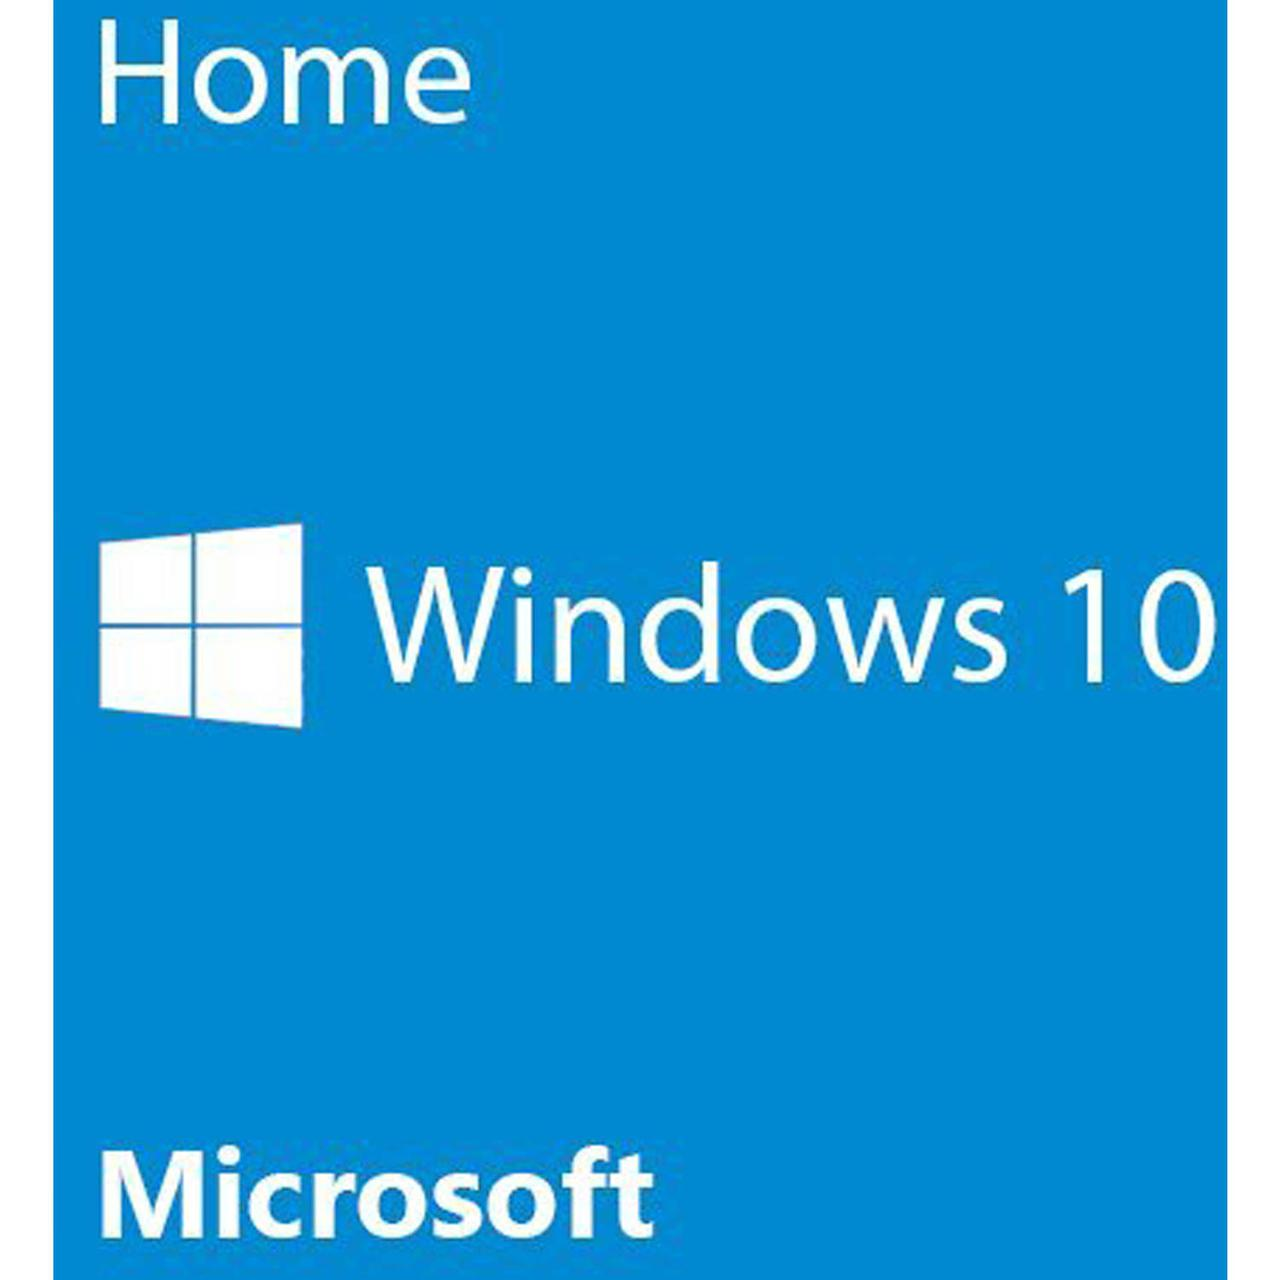 Операционная система Microsoft Windows Home 10 Win32 KW9-00117 (OEM/OEI)